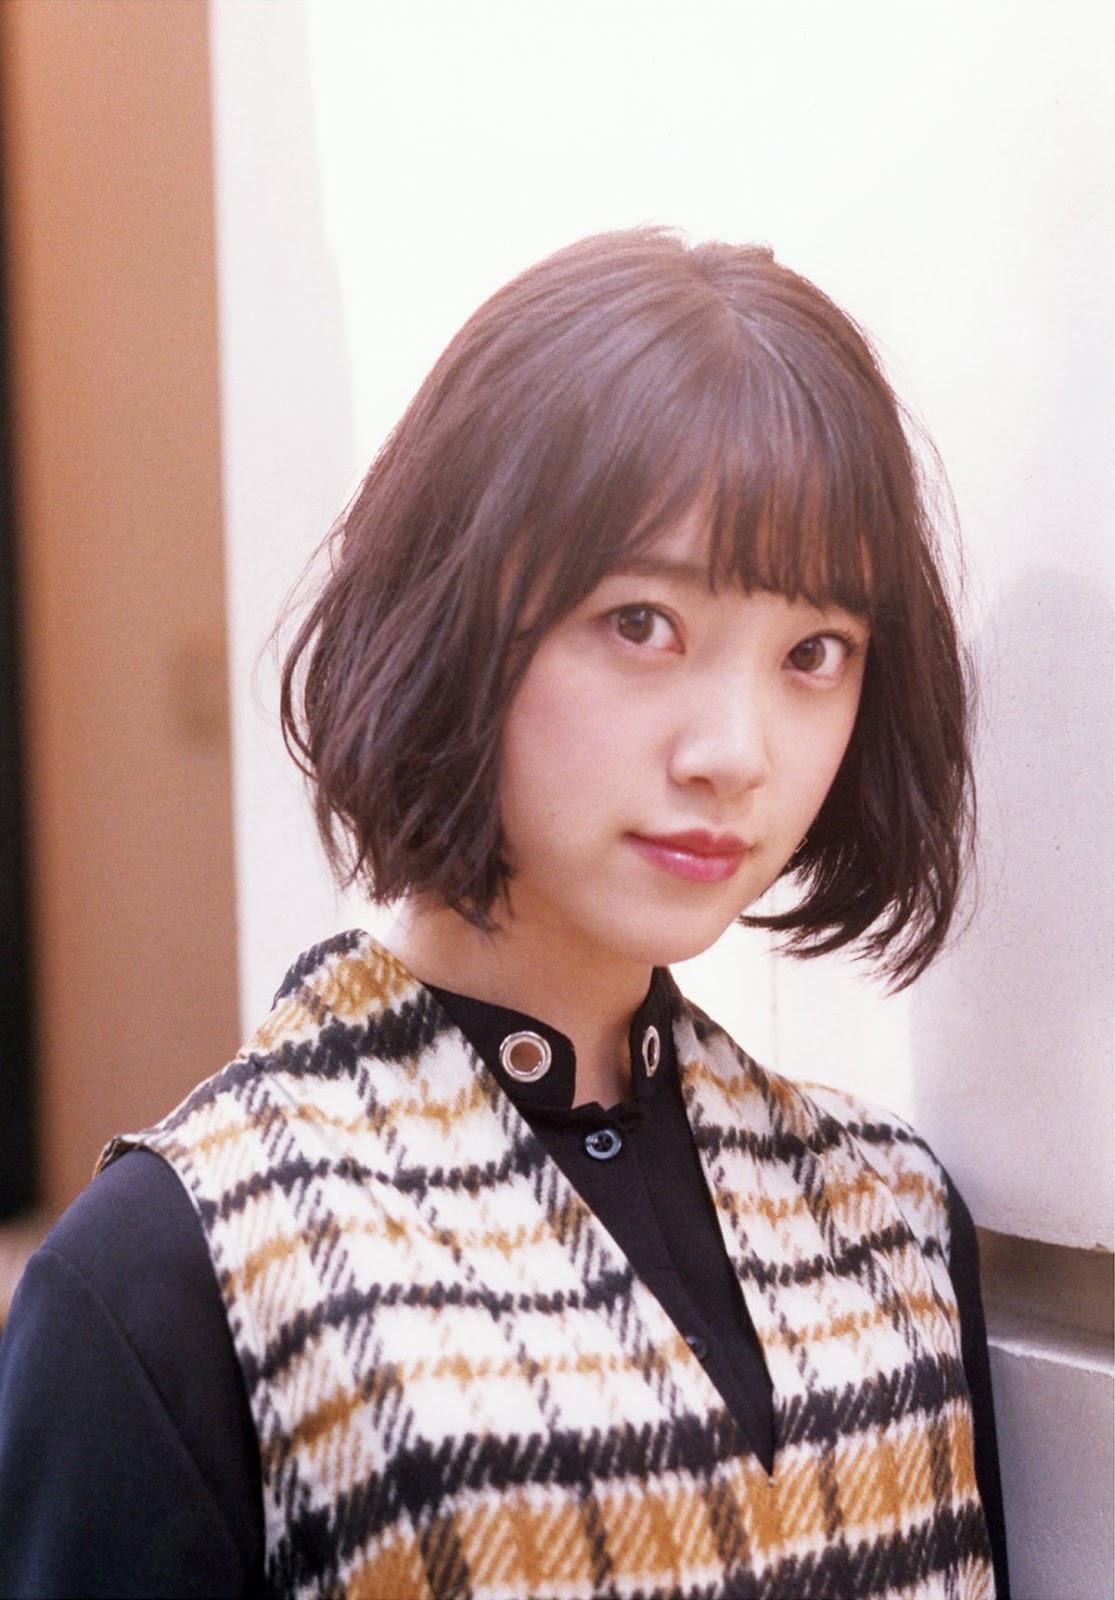 Hori Miona 堀未央奈, BRODY 2017.09 (ブロディ 2017年9月号)